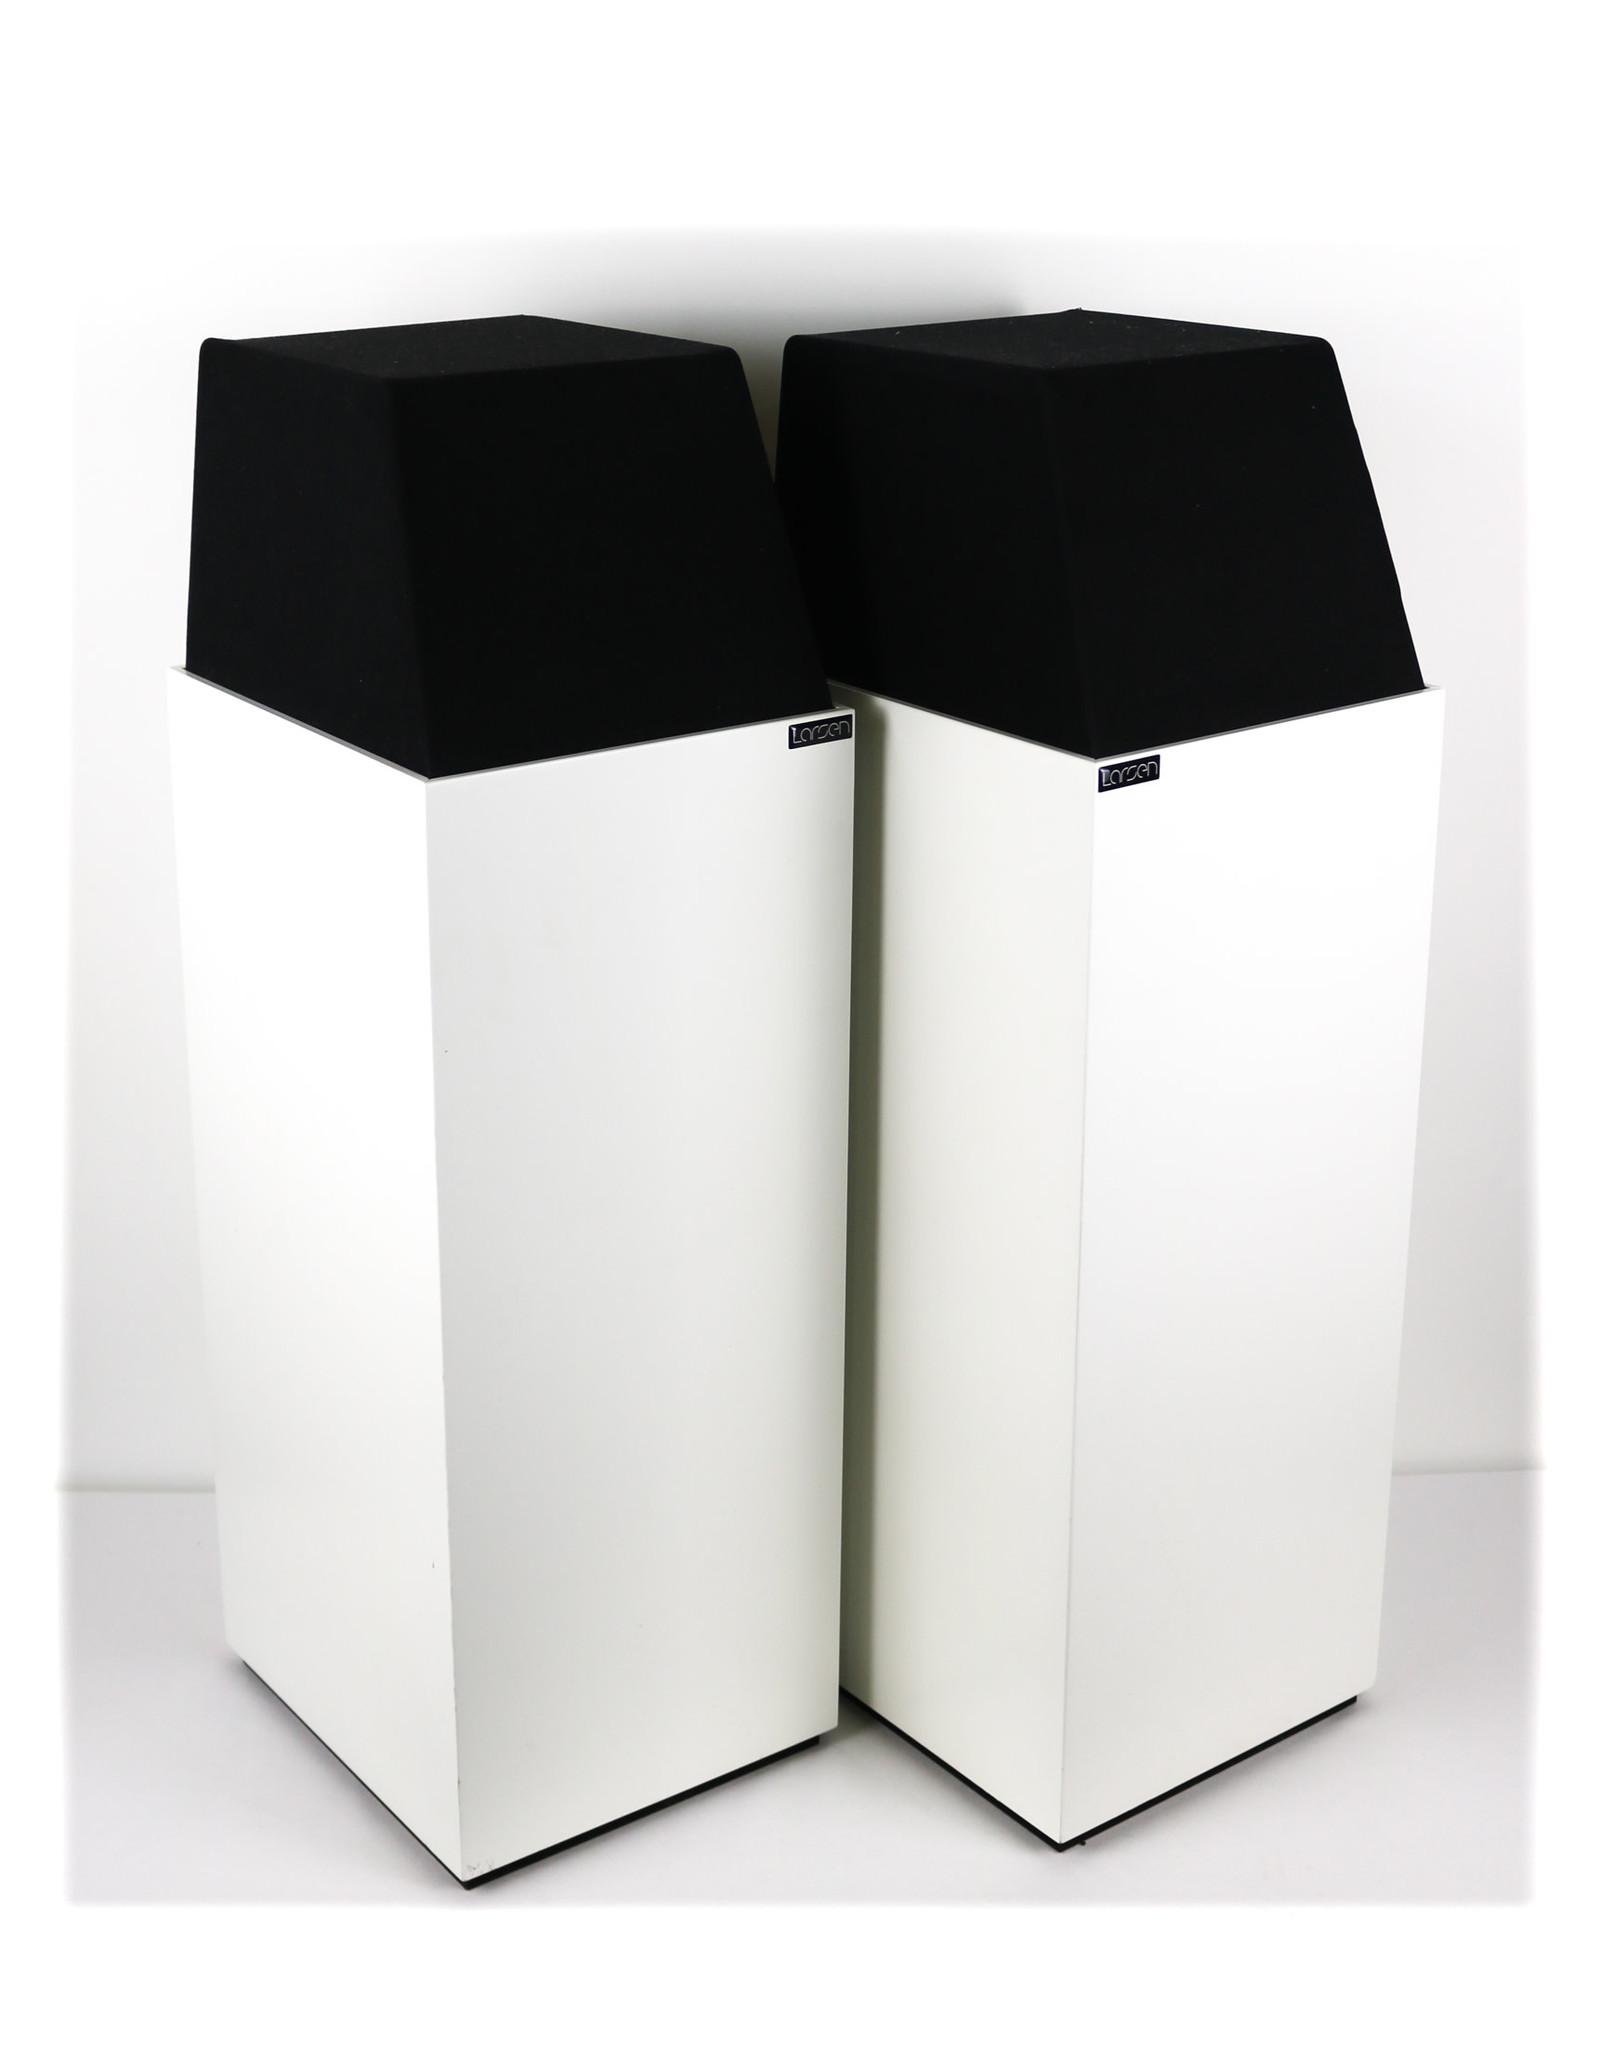 Larsen Larsen 4.2 Floorstanding Speakers White EX-DEMOS USED